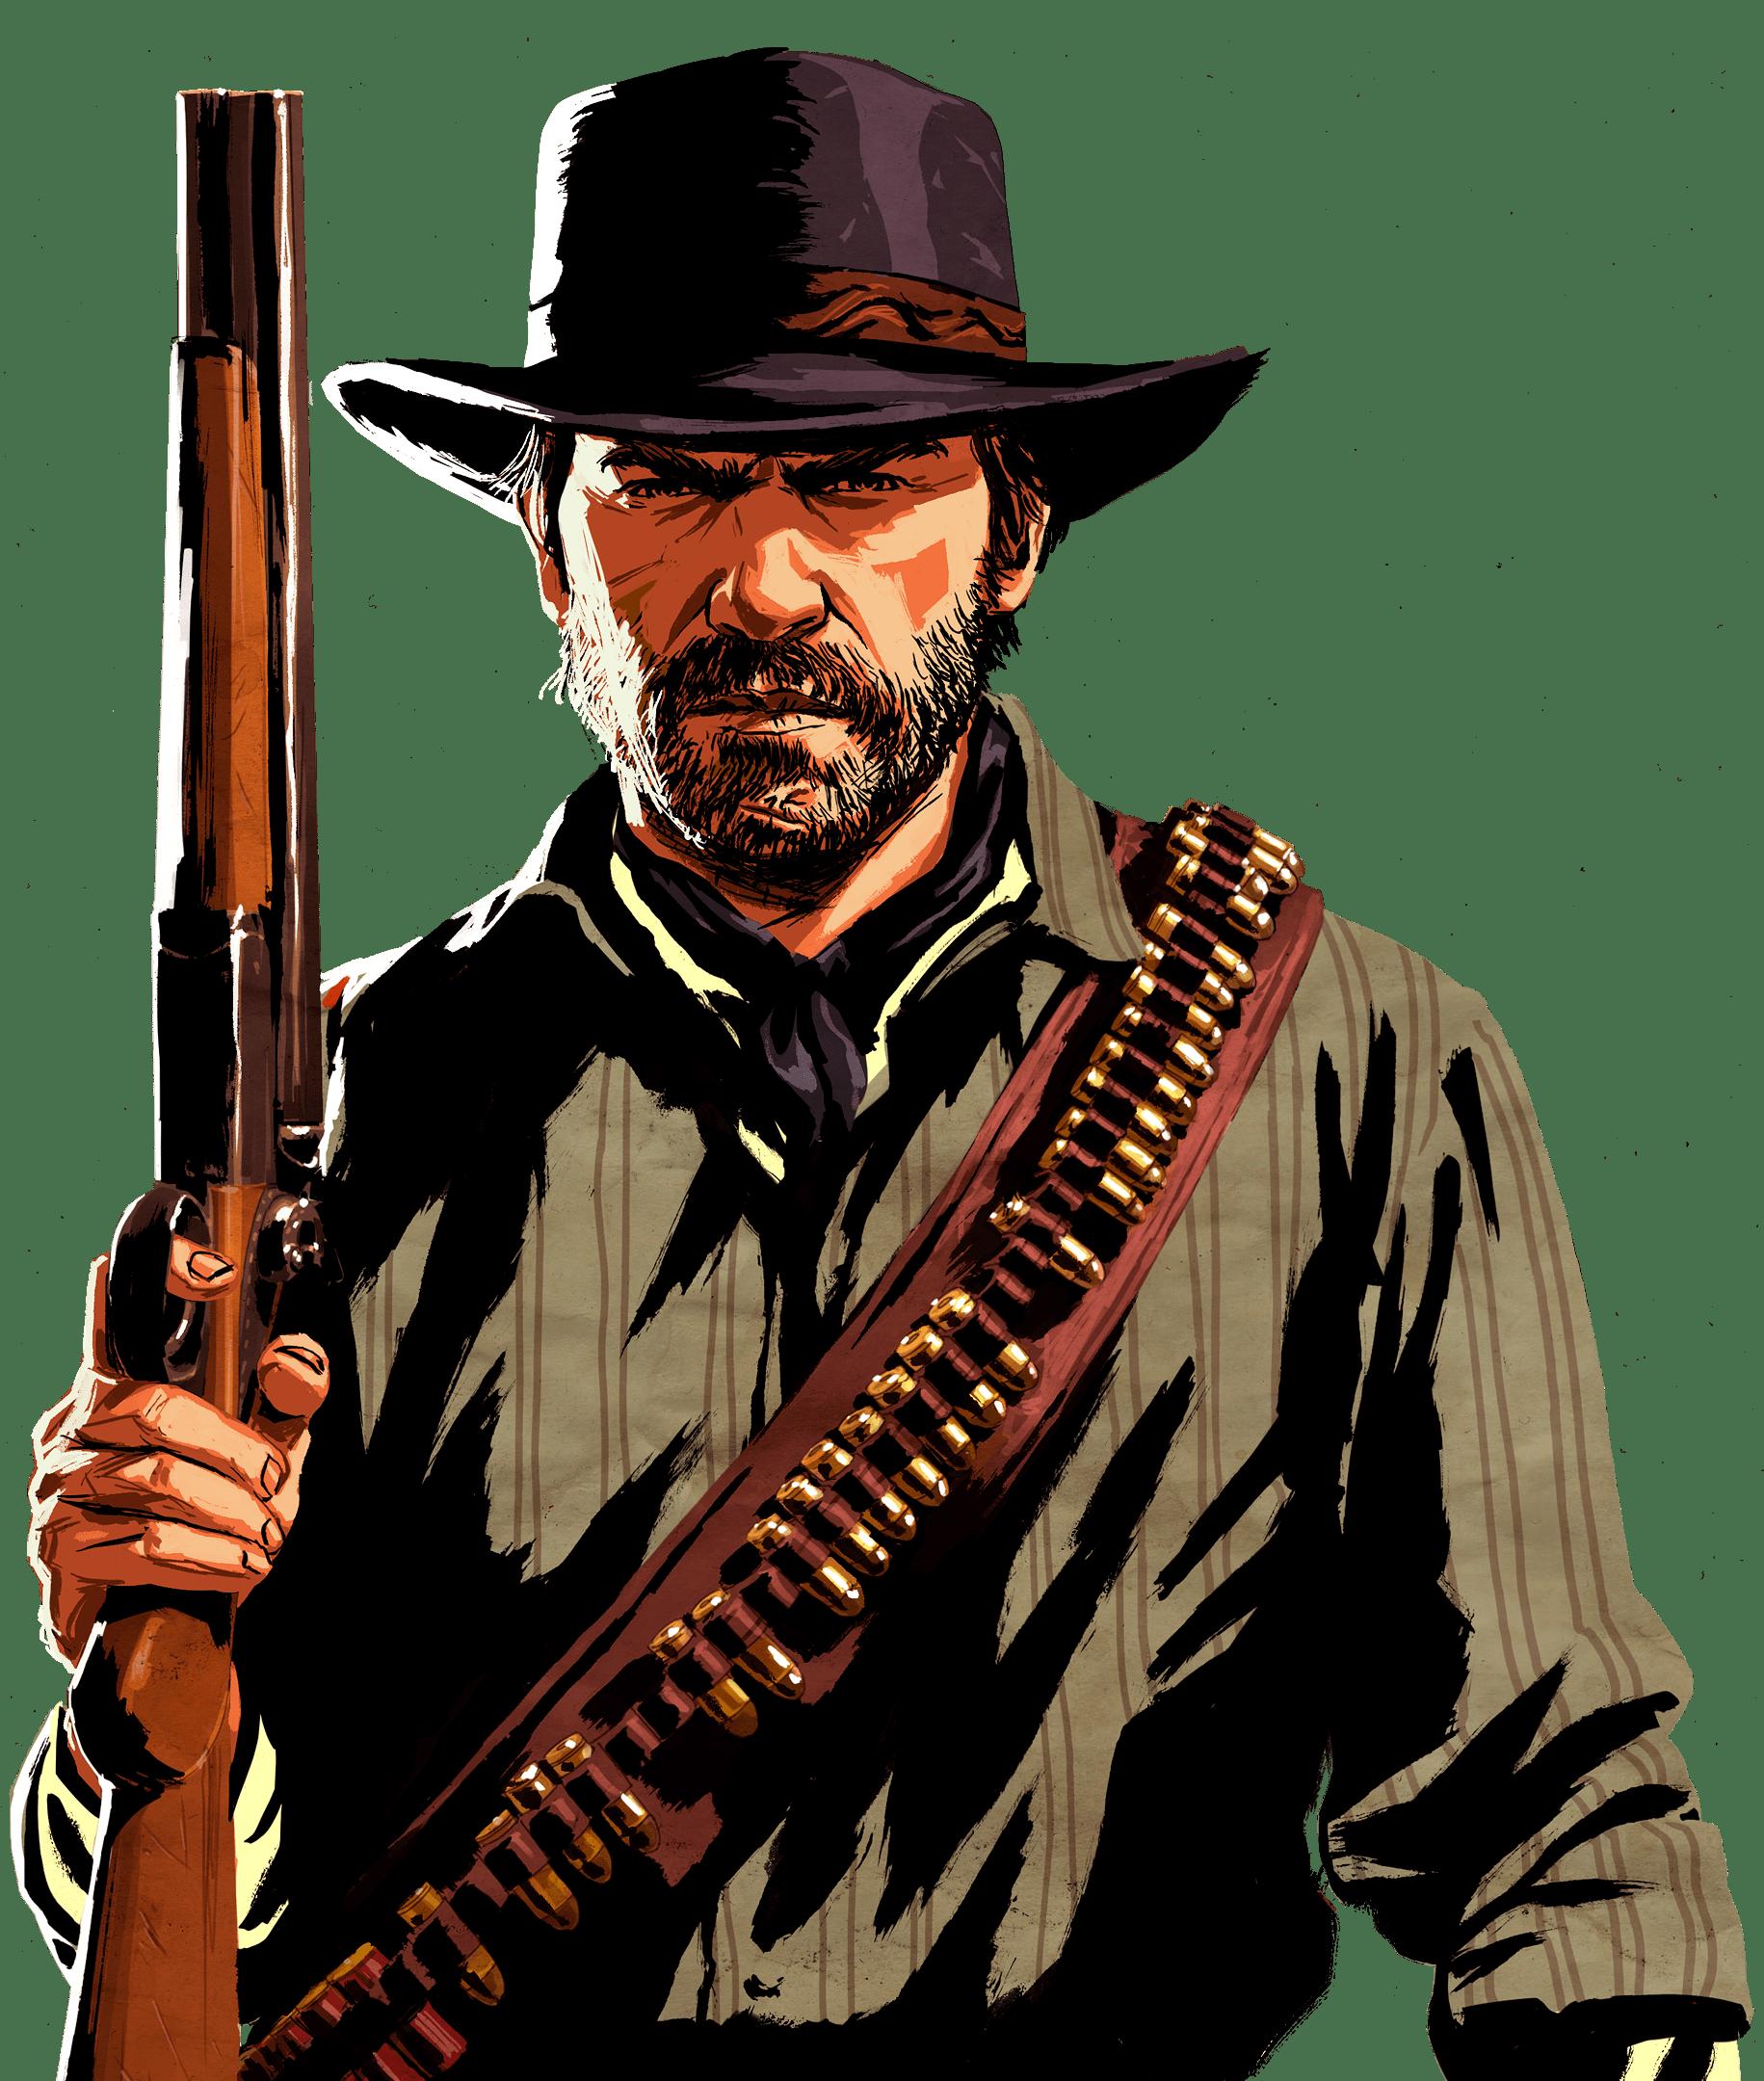 Arthur Morgan Wallpaper De Desenhos Animados Desenho De Rosto Red Dead Redemption